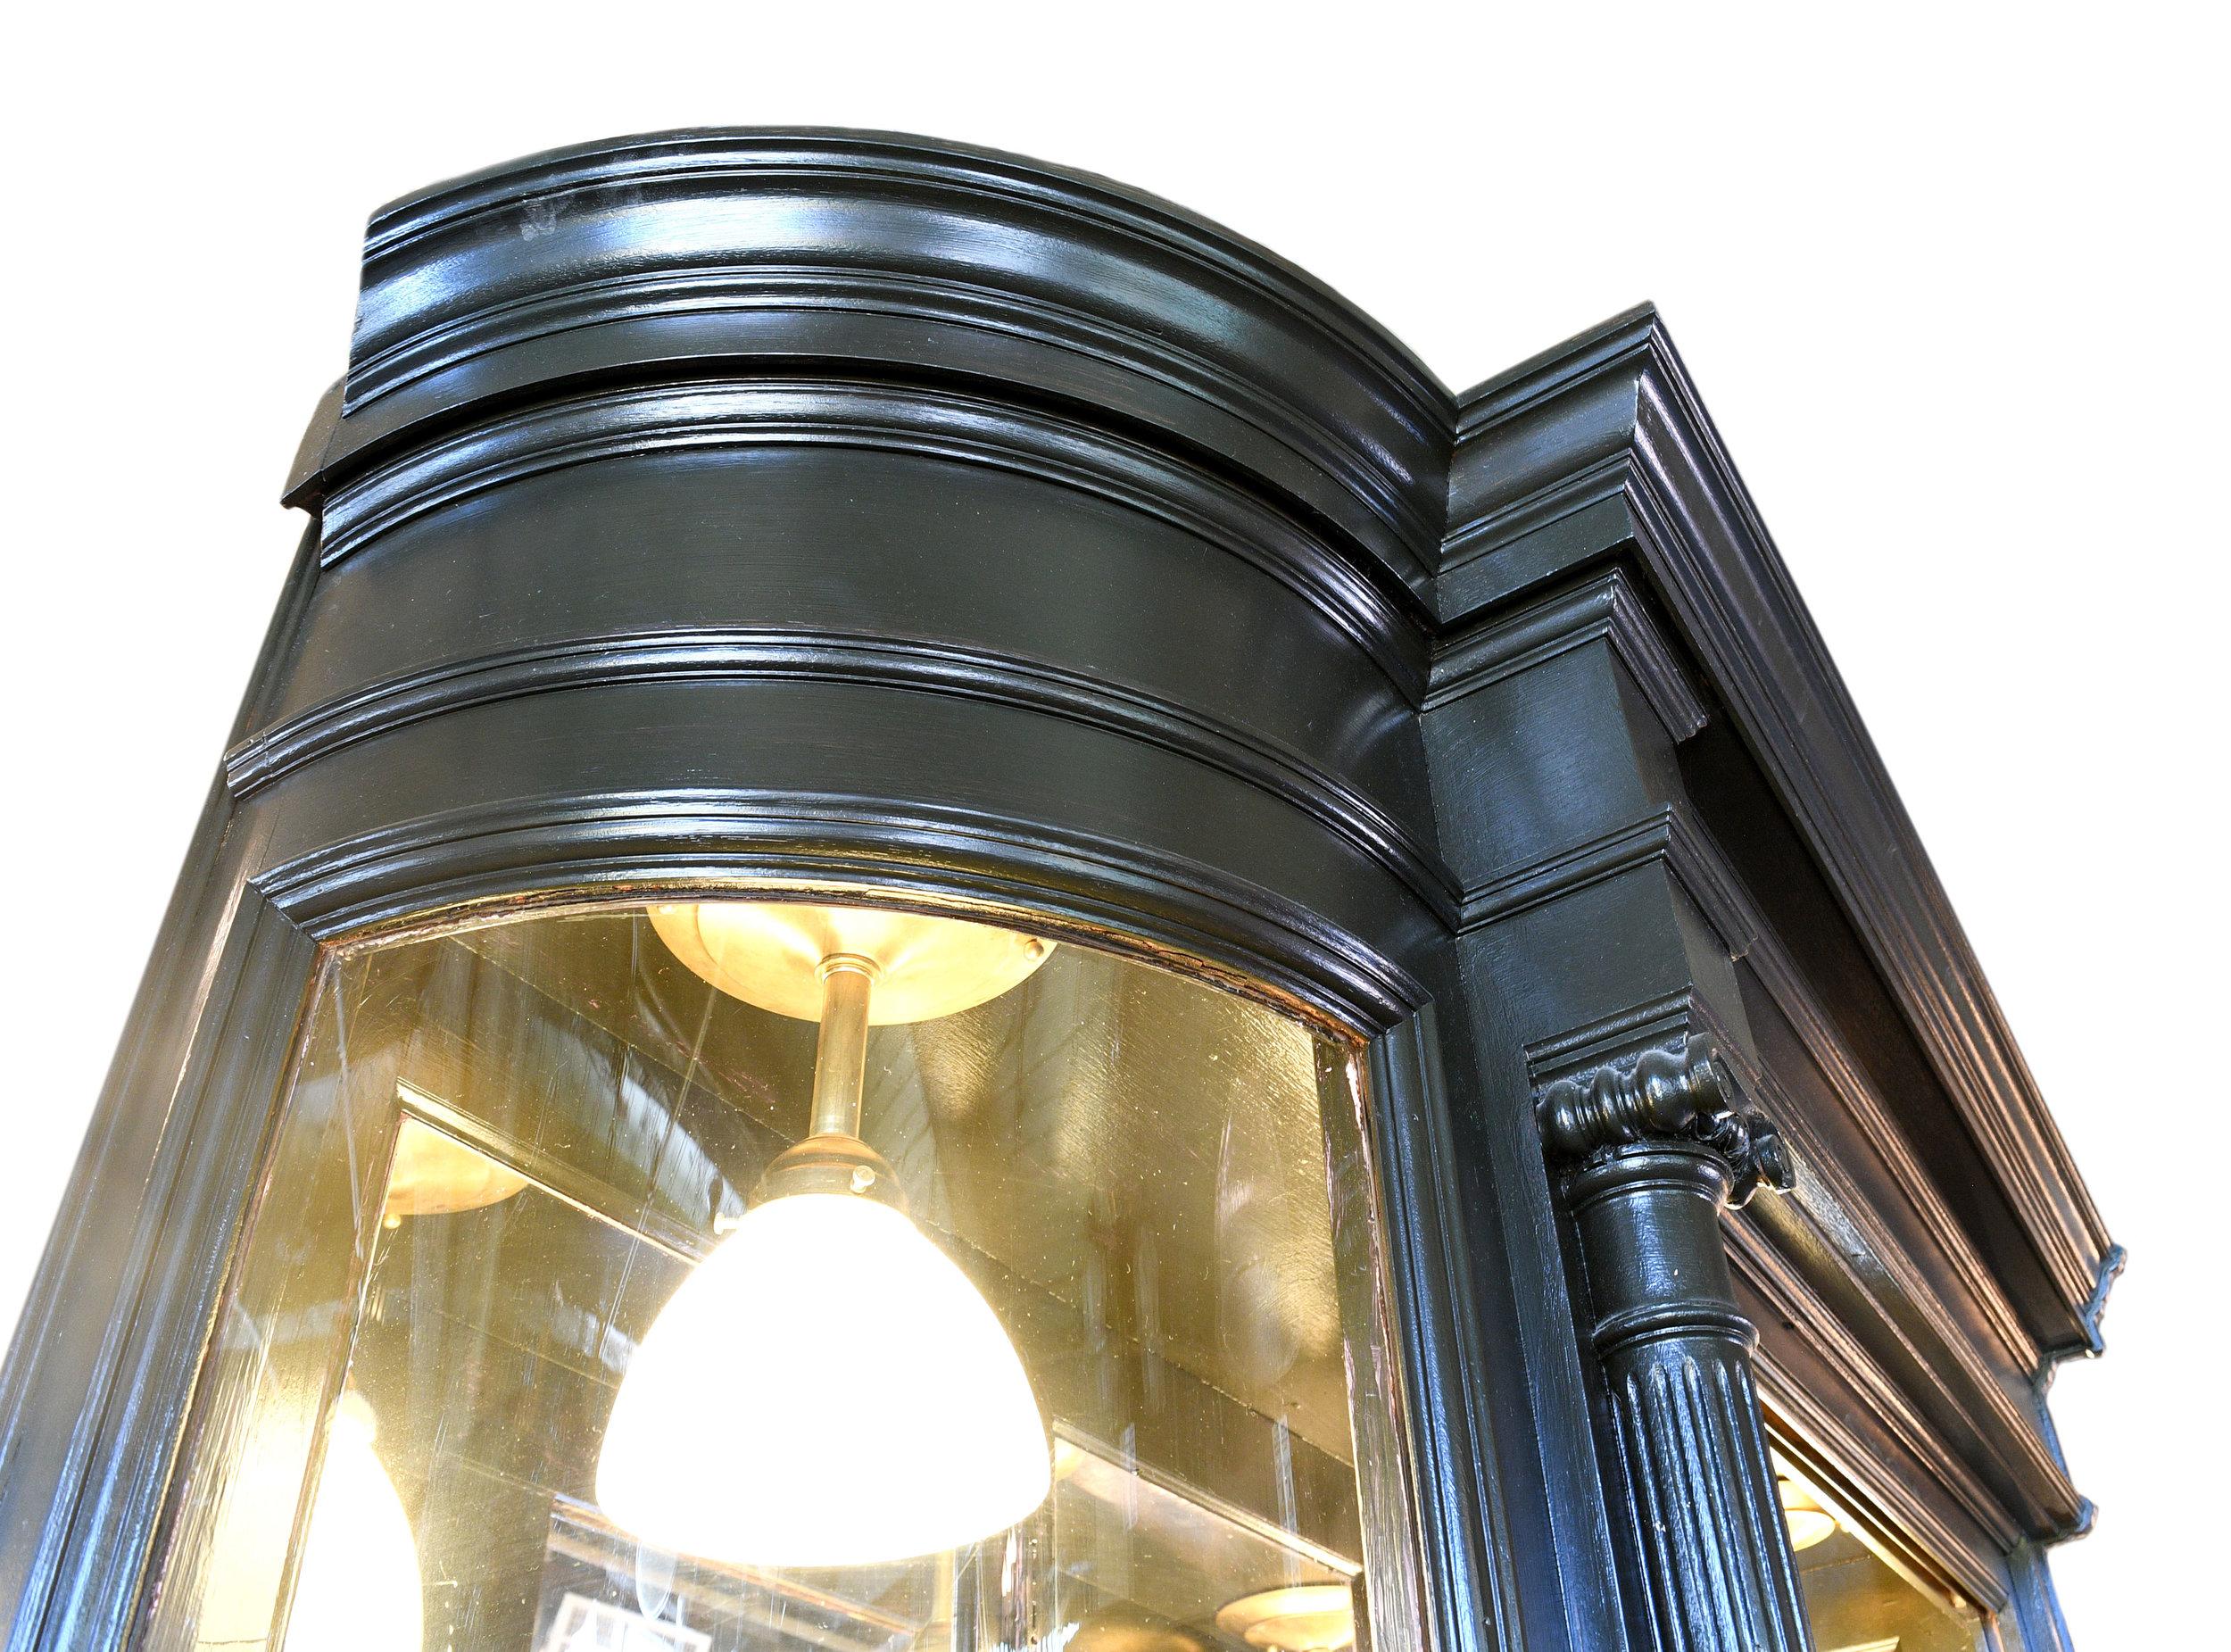 48317-mirrored-cabinet-2.jpg